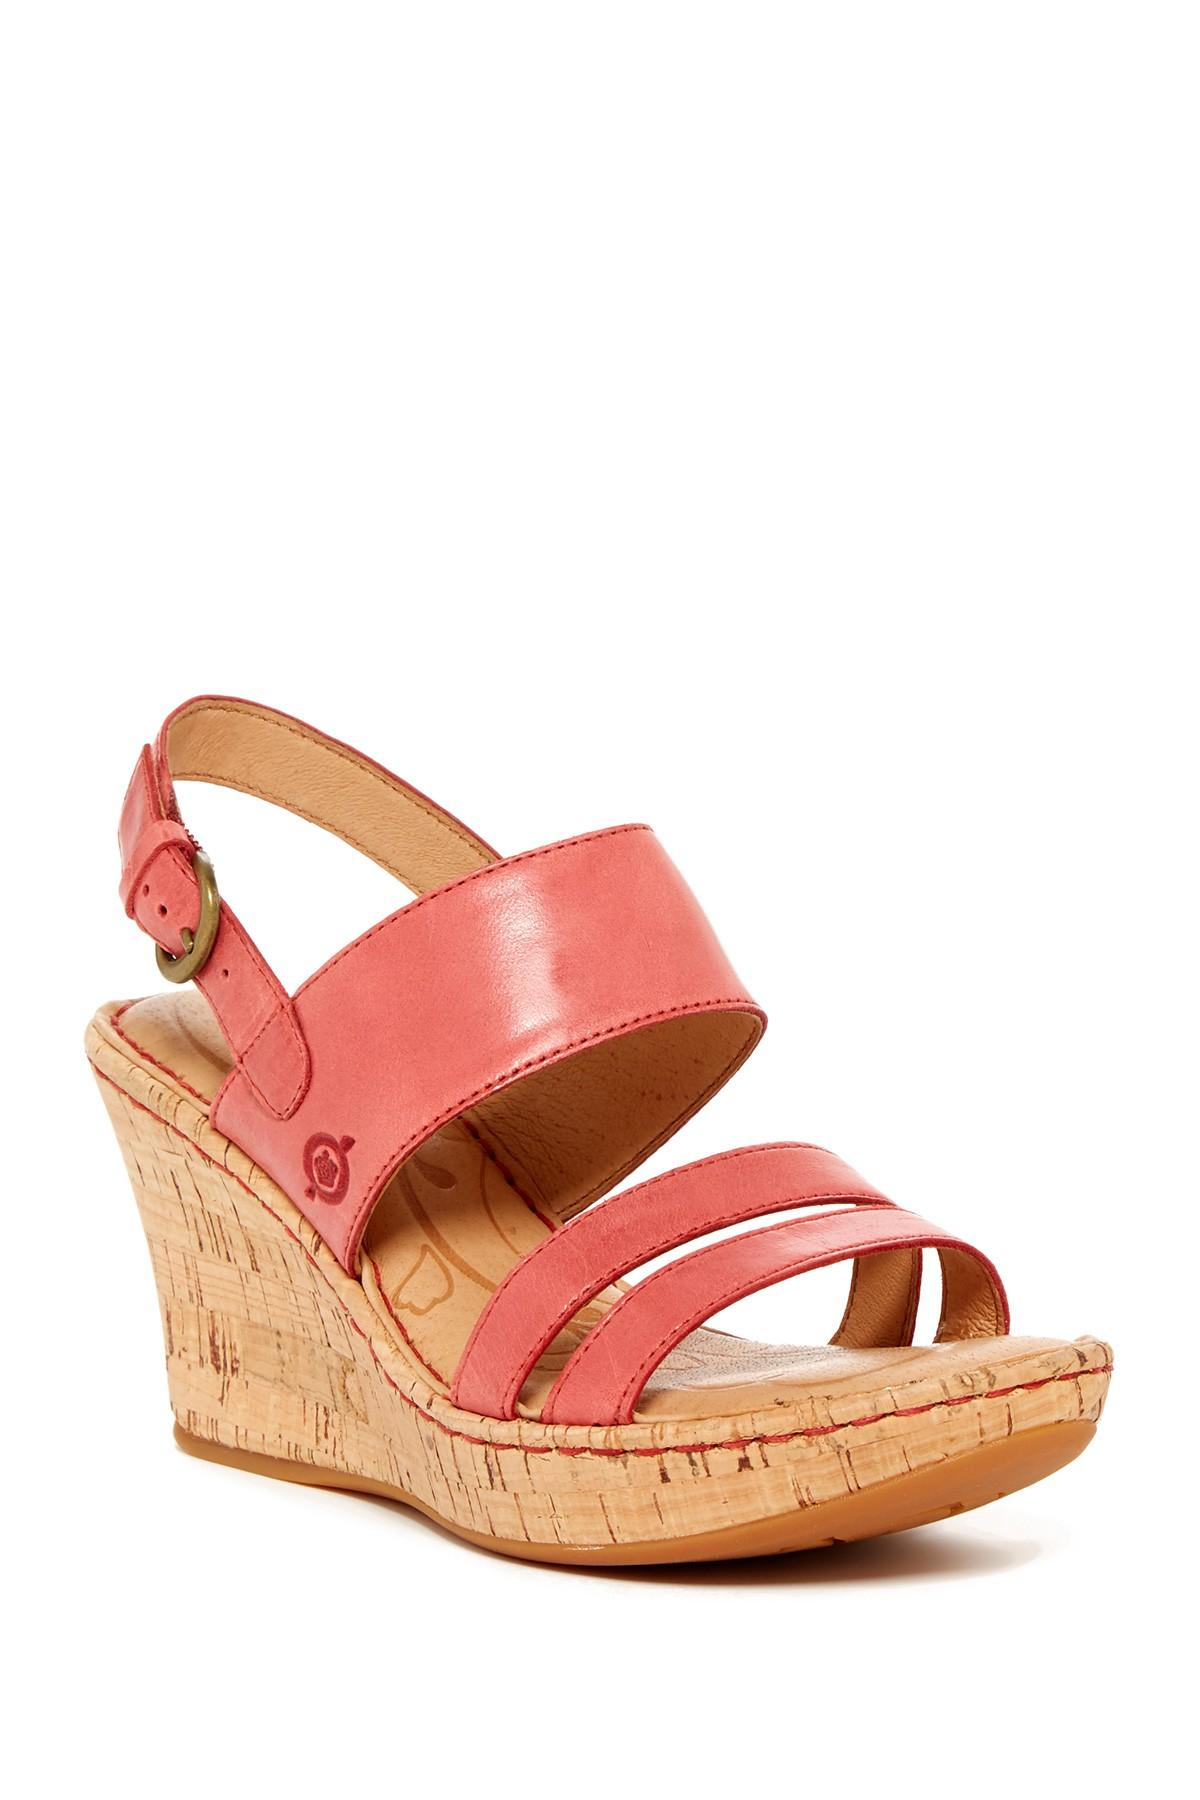 born amabel wedge sandal in lyst